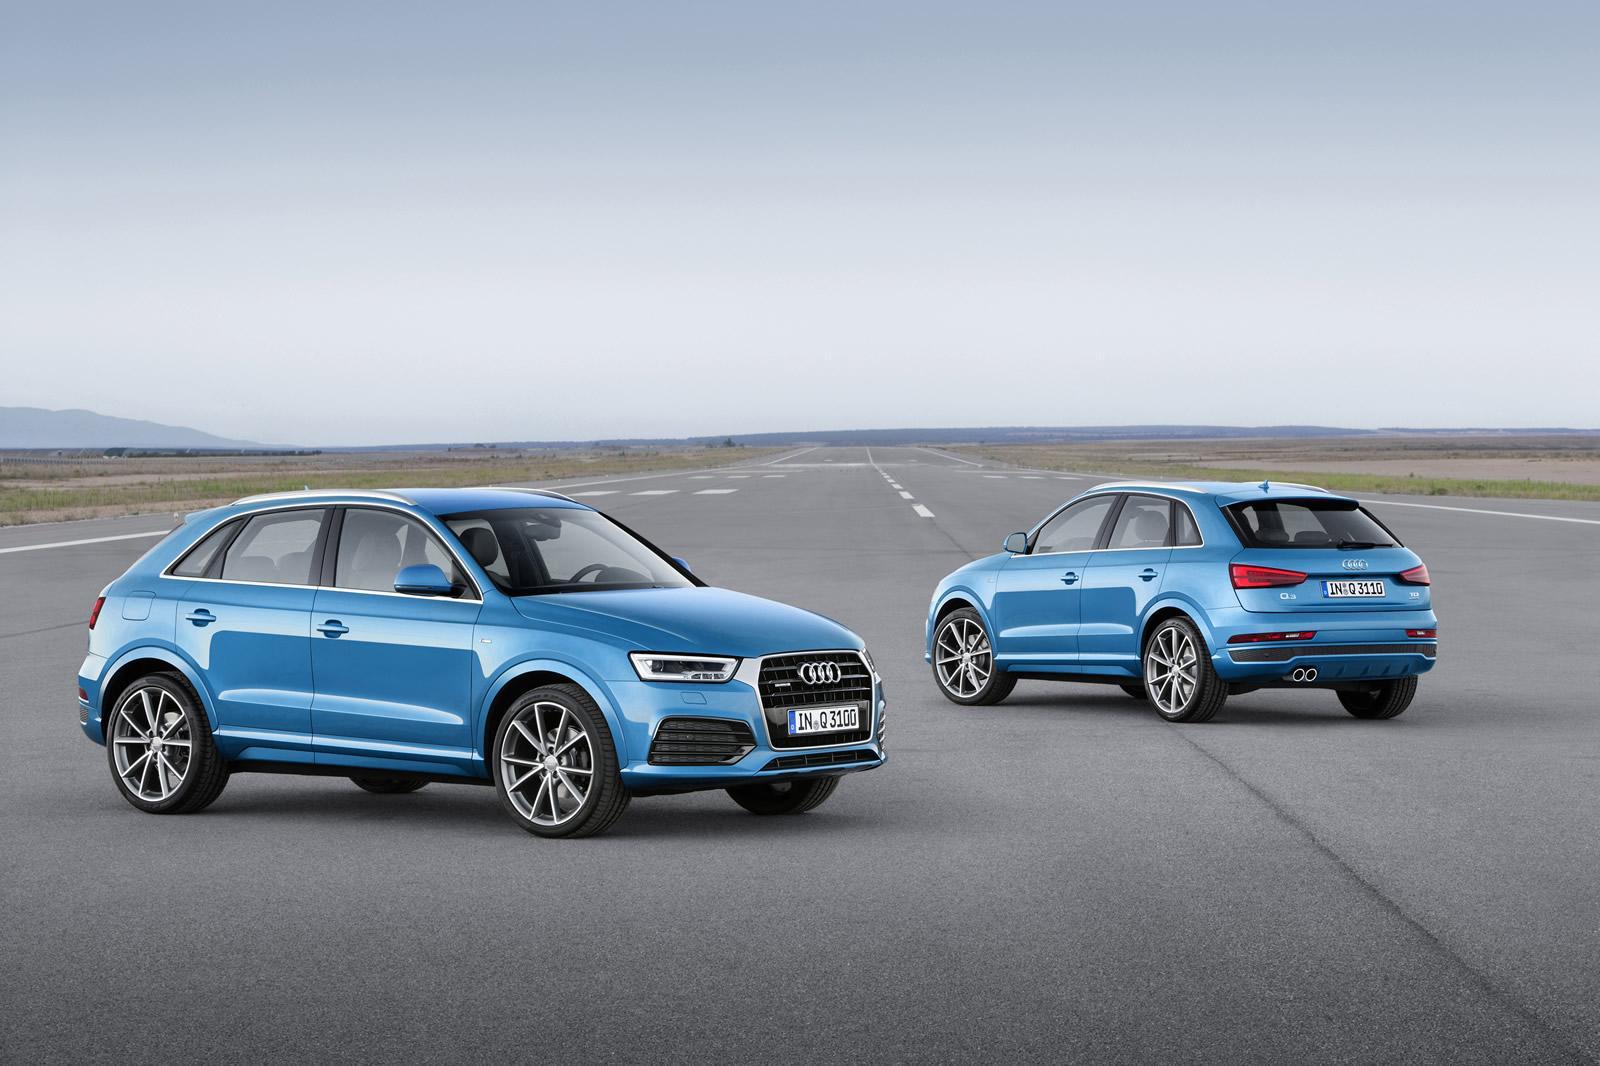 2015 Audi Q3 facelift front and rear quarter